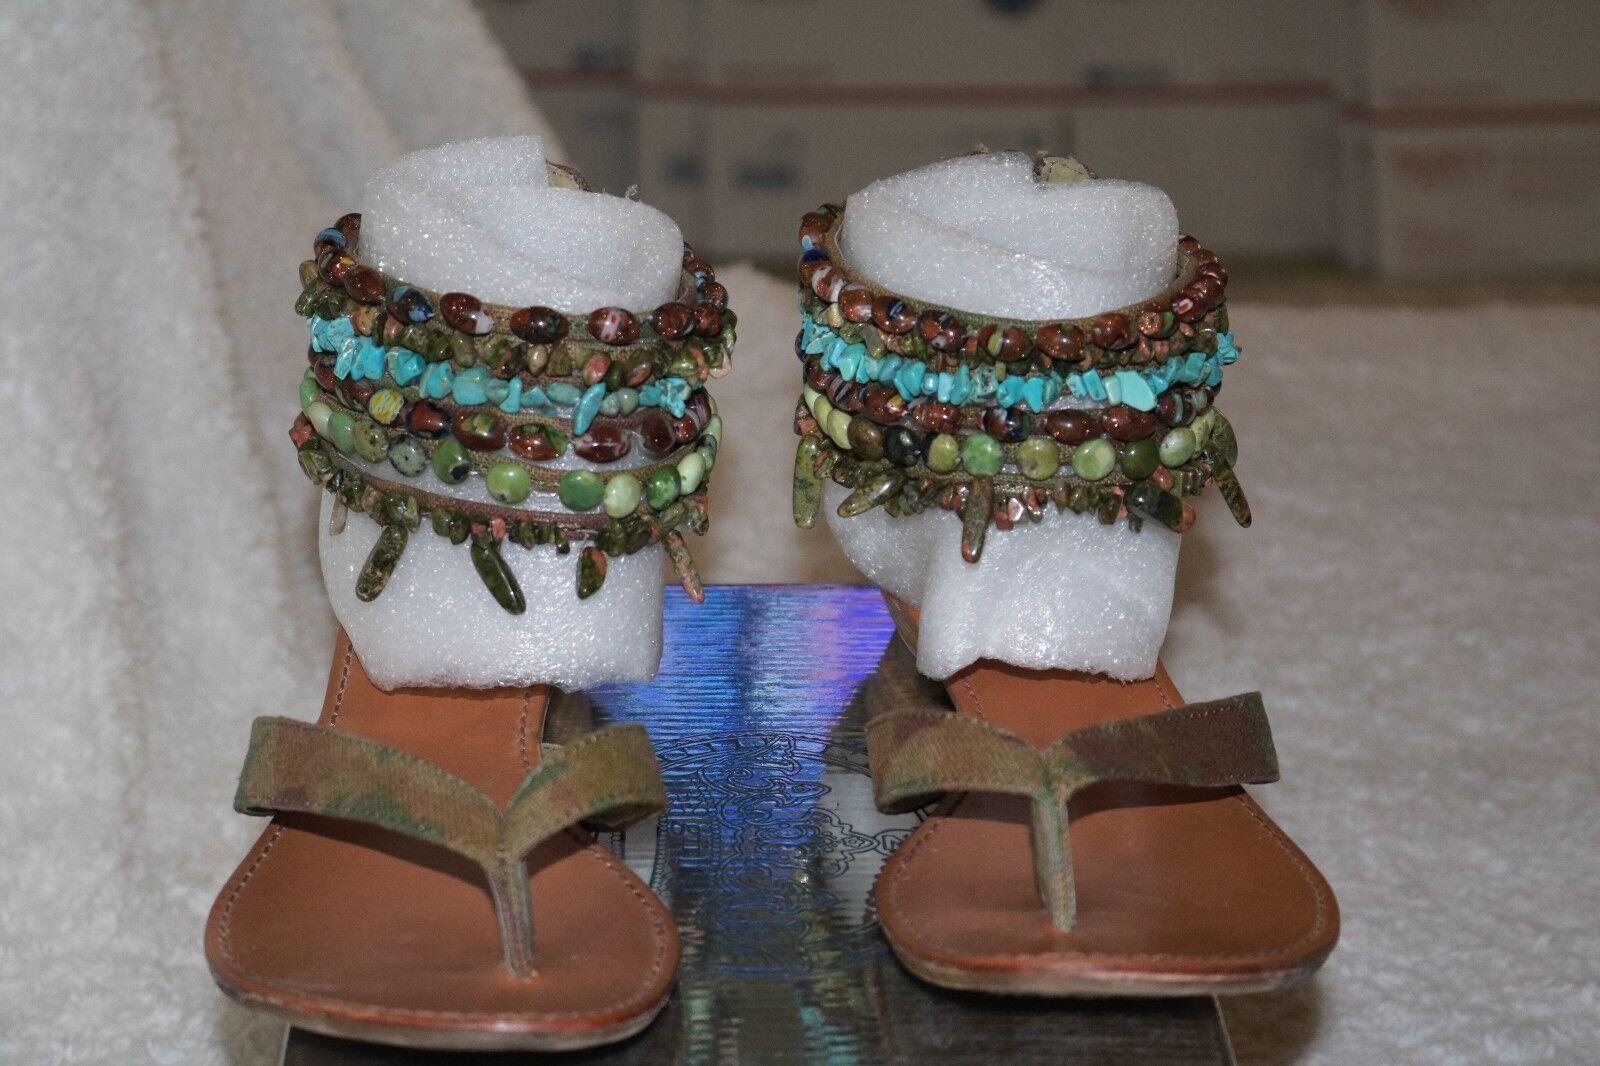 Zigi Girl Wedge Camo Sandals w  Multi Strap Bead & Stones RET  70.00 CUTE